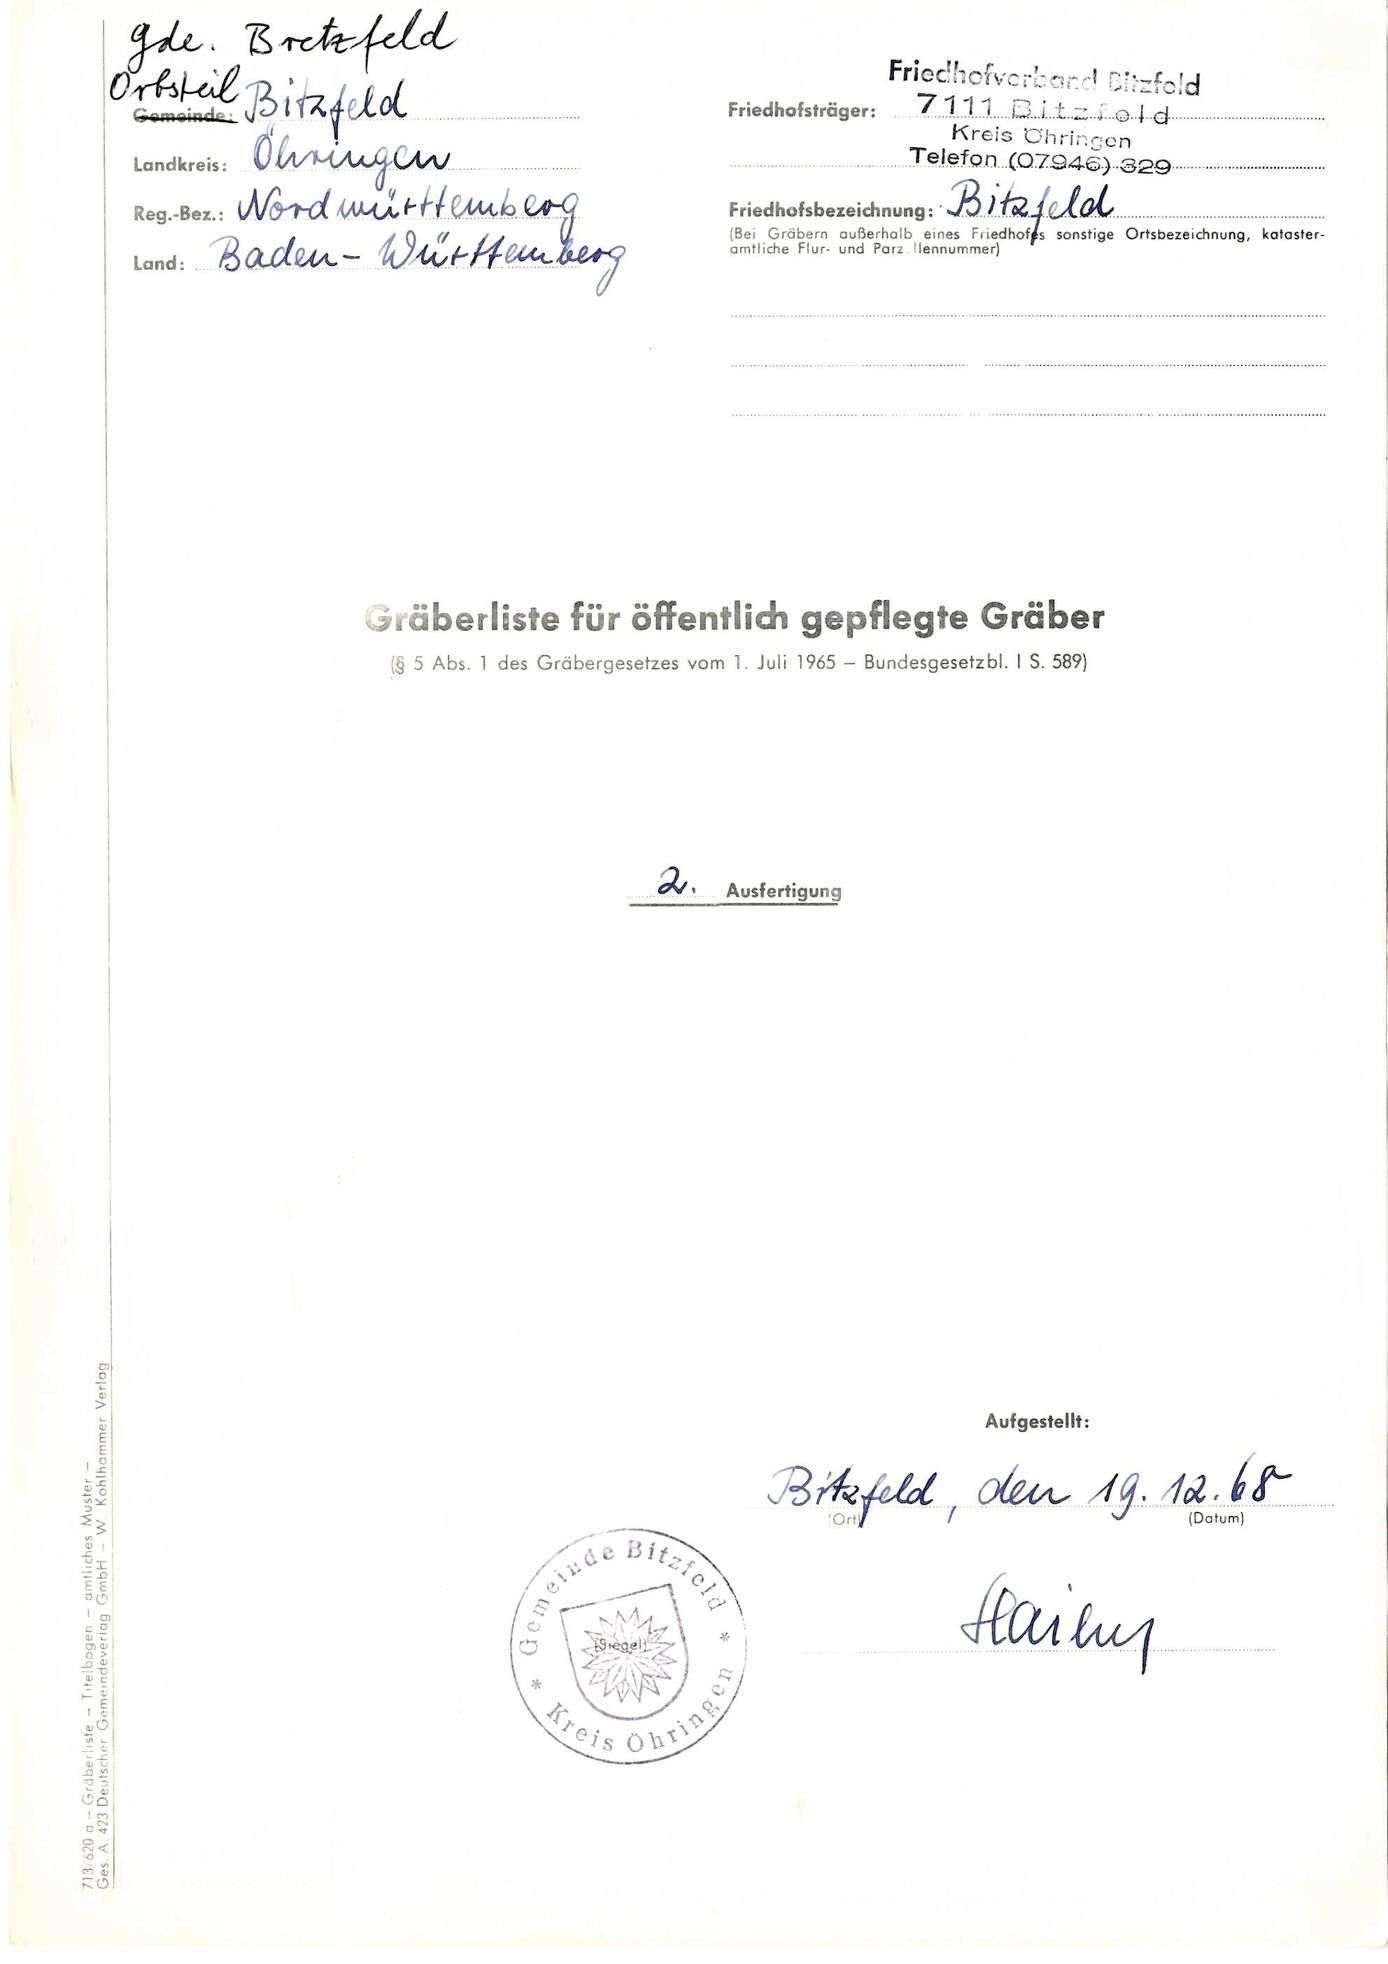 Bitzfeld, Bild 1